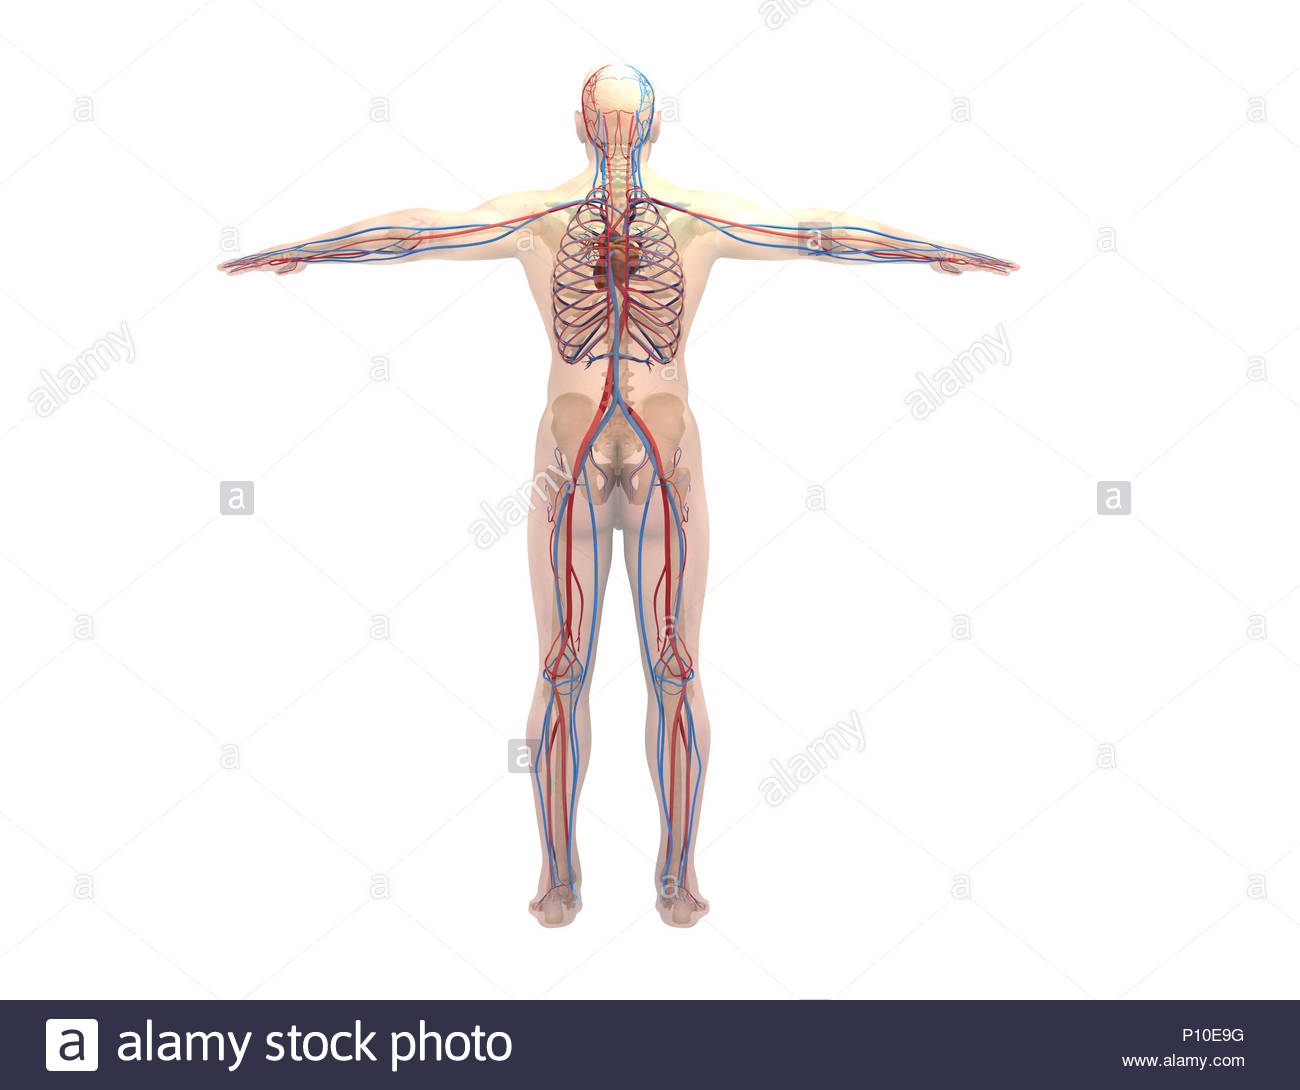 Dorsal Artery Stock Photos & Dorsal Artery Stock Images - Alamy